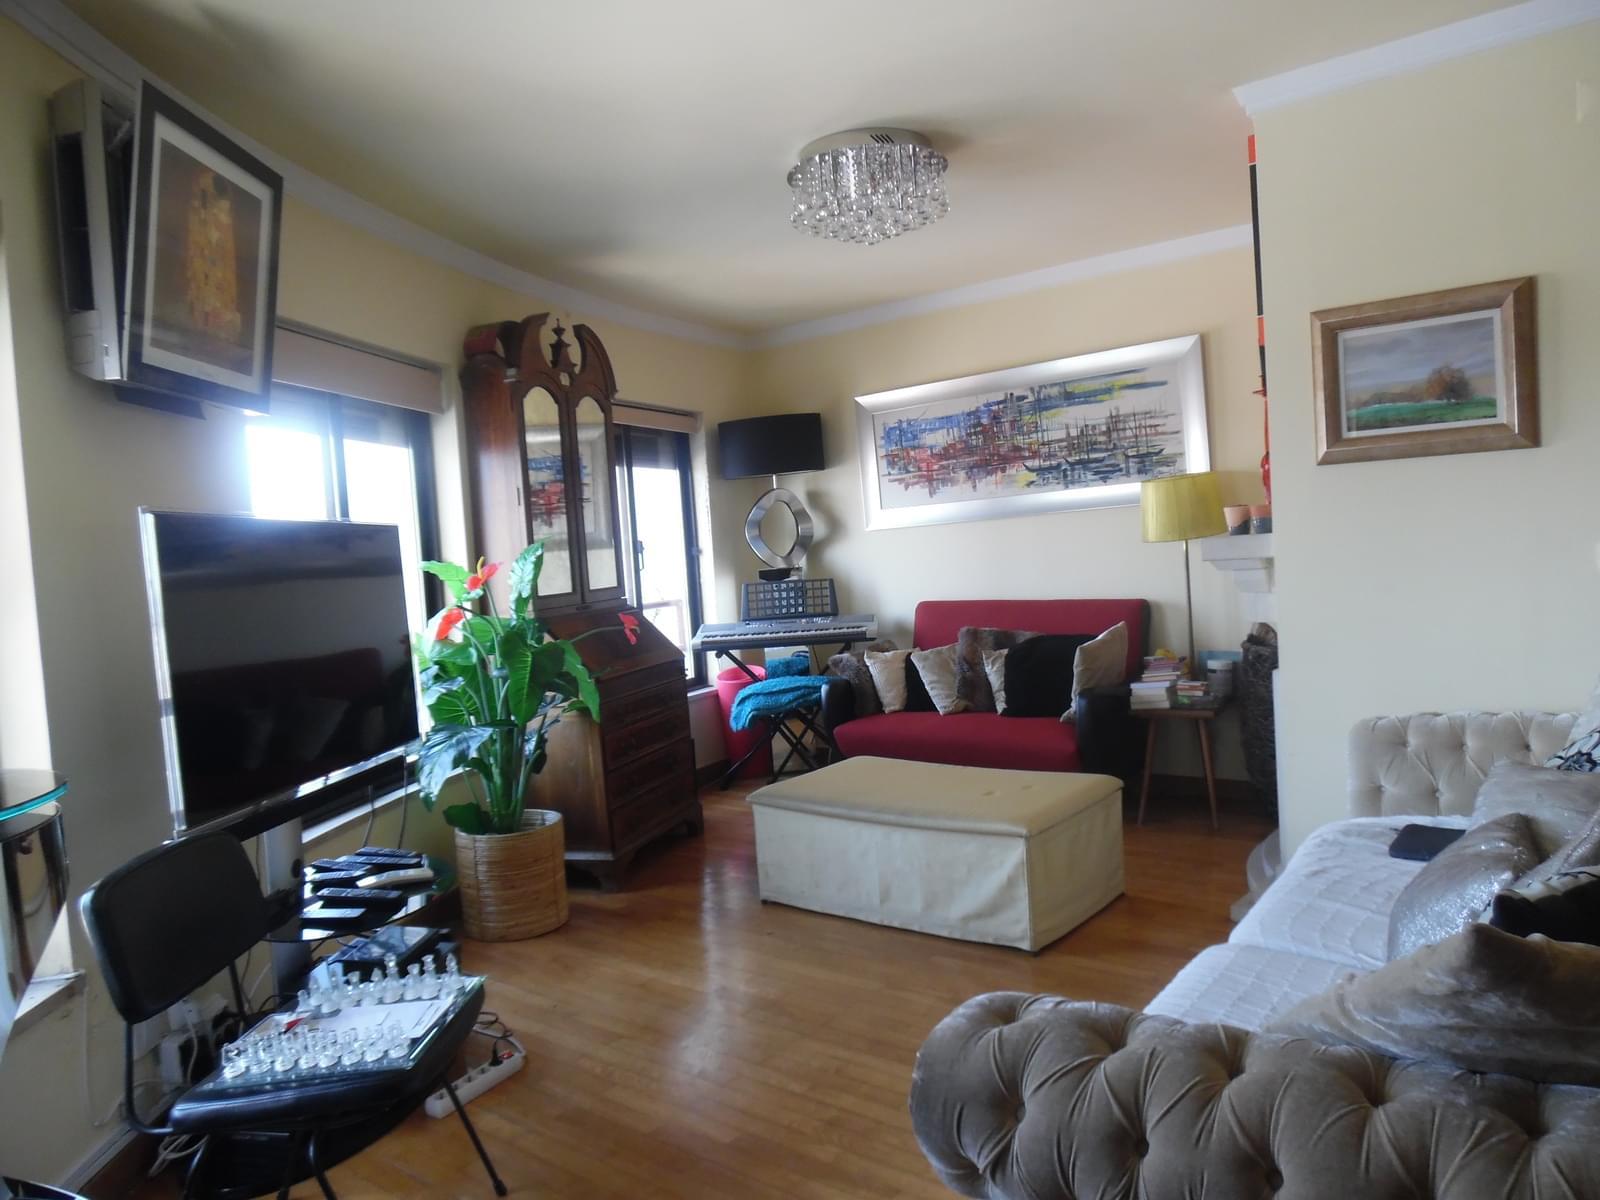 pf17977-apartamento-t2-lisboa-cf5d40f6-68ff-4cd5-b6fb-647c0e199a97